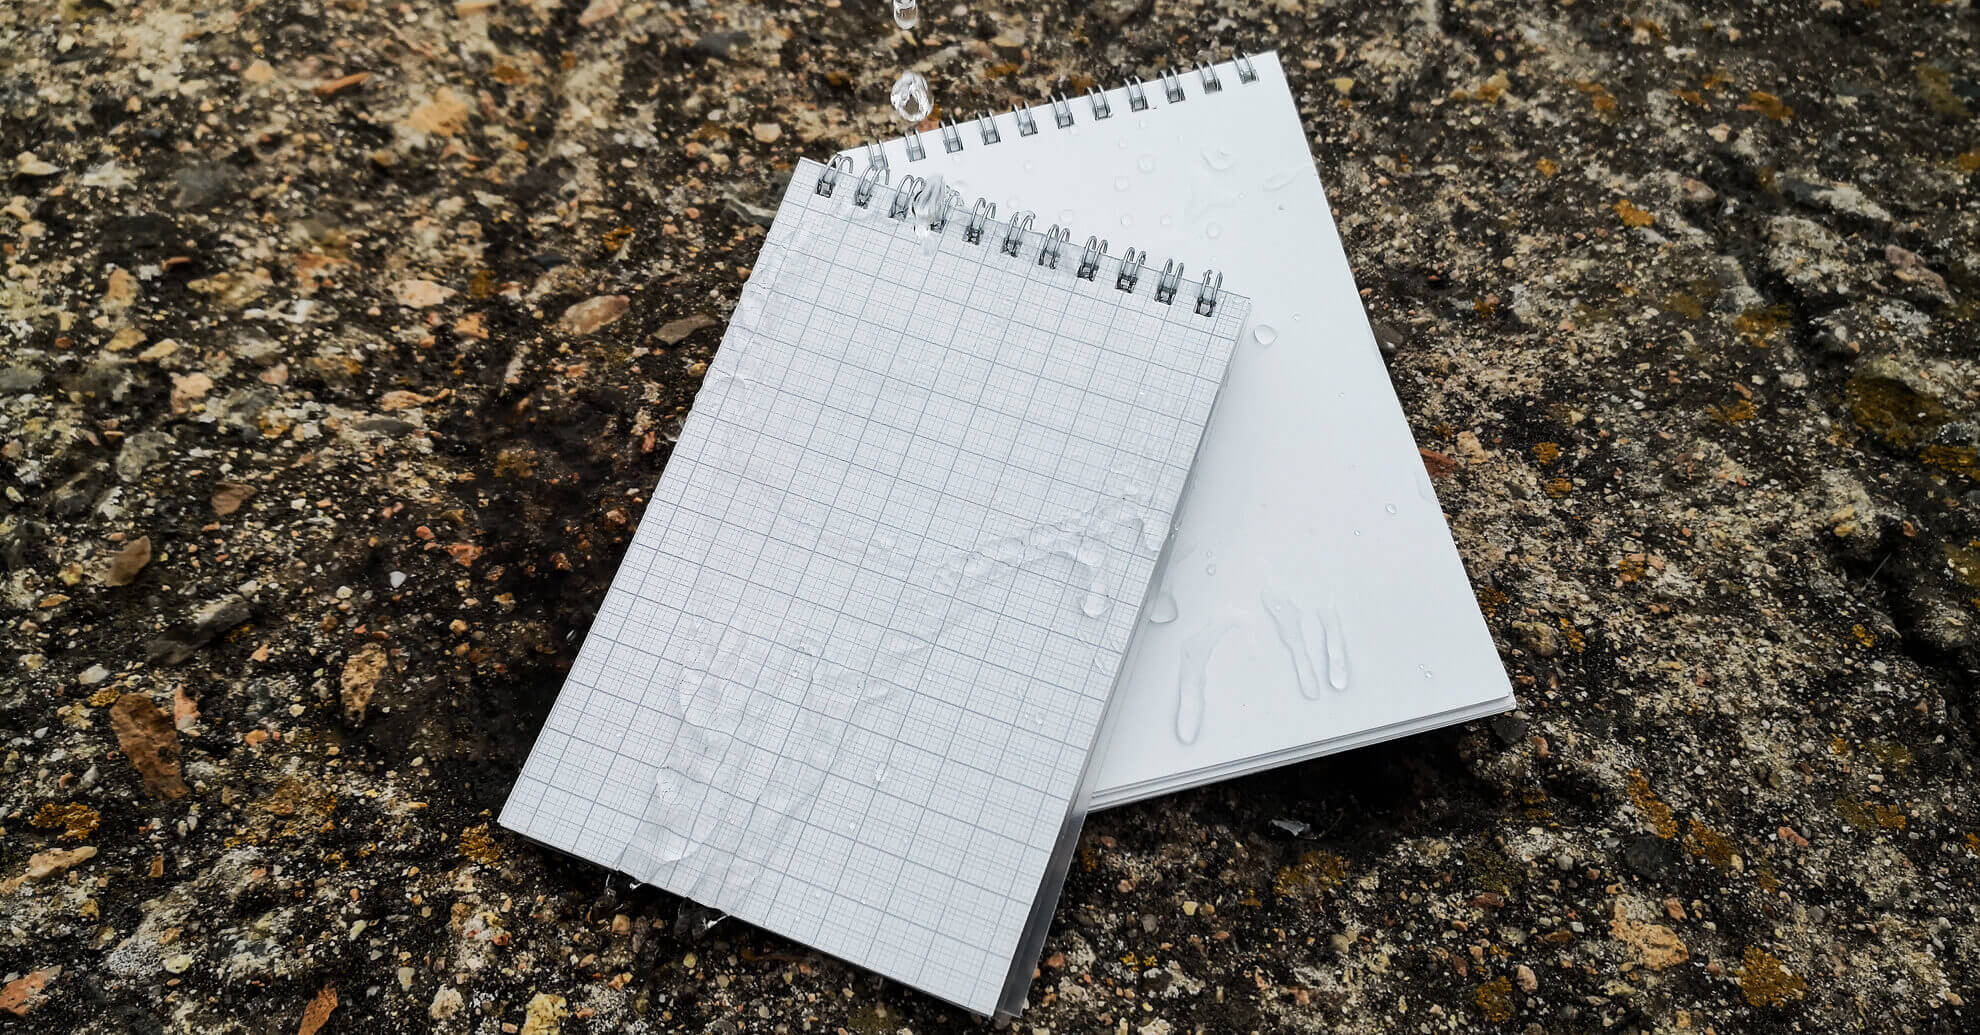 block notes carta impermeabile millimetrata